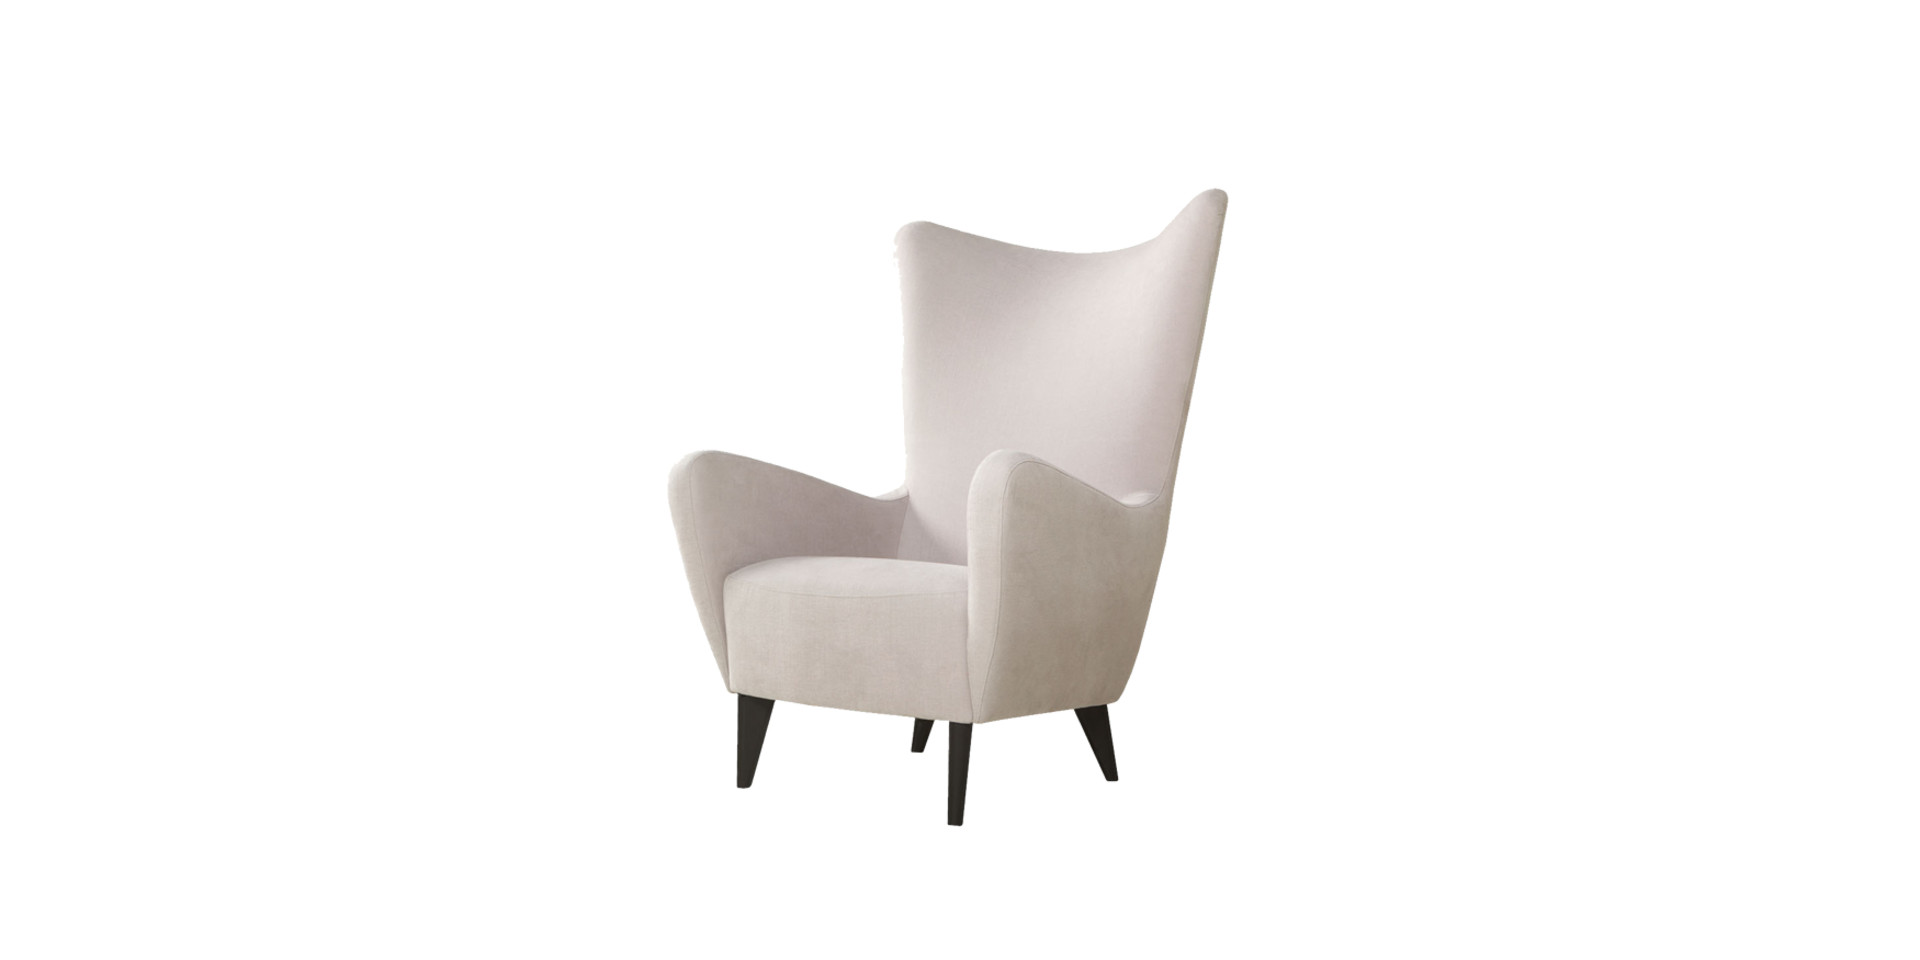 sits-kato-fauteuil-armchair_caleido10996_grey-beige_5